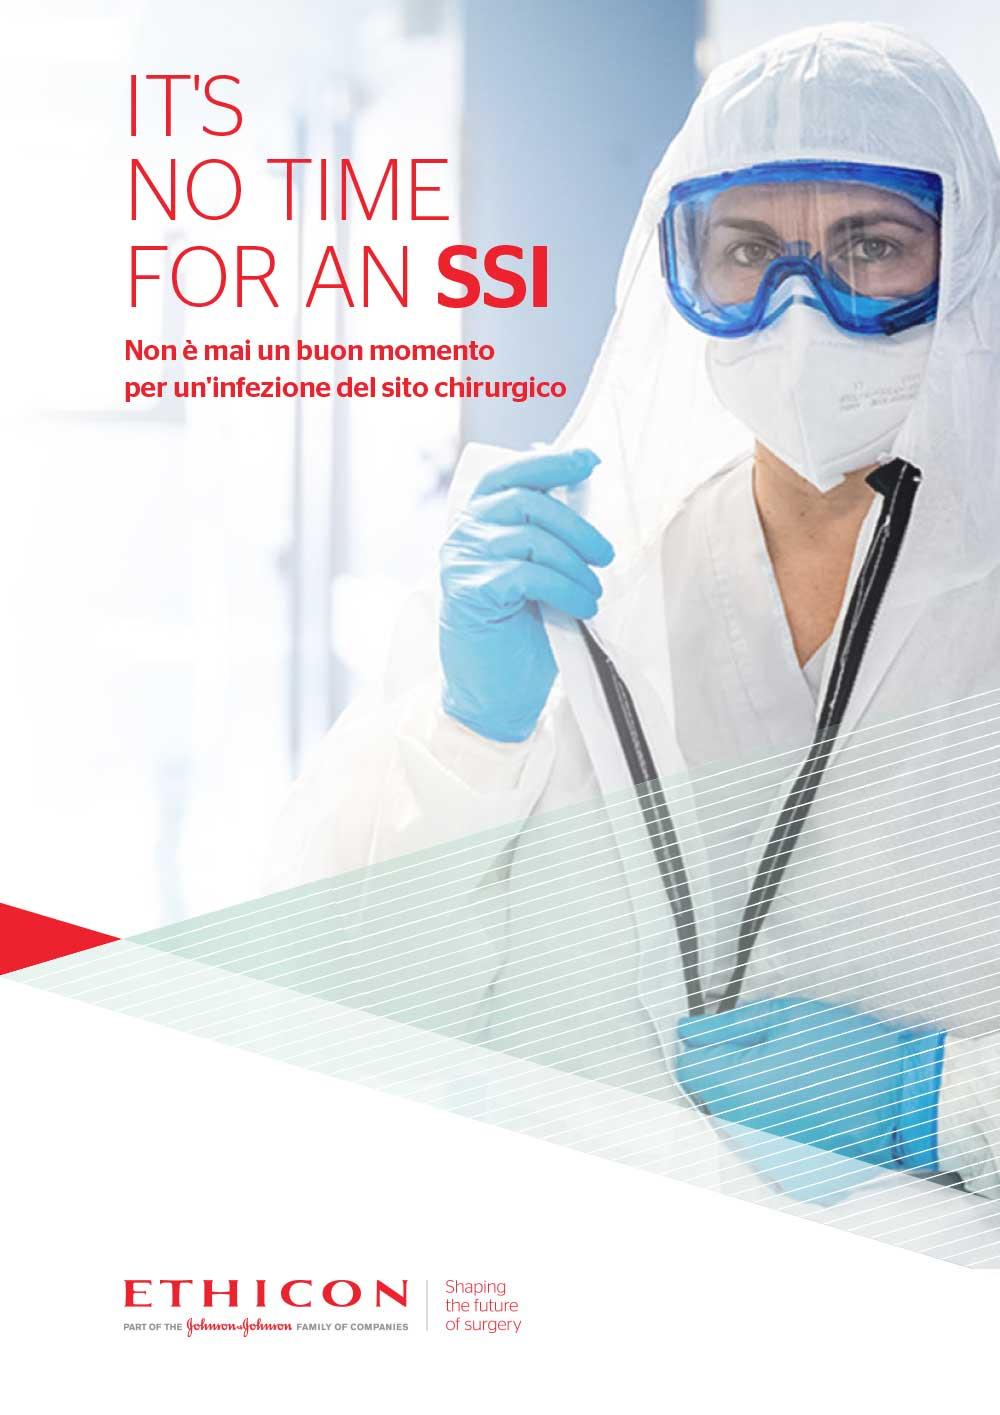 https://www.minicardiacsurgery-univpm-research.com/wp-content/uploads/2021/05/SSI-onepage.jpg